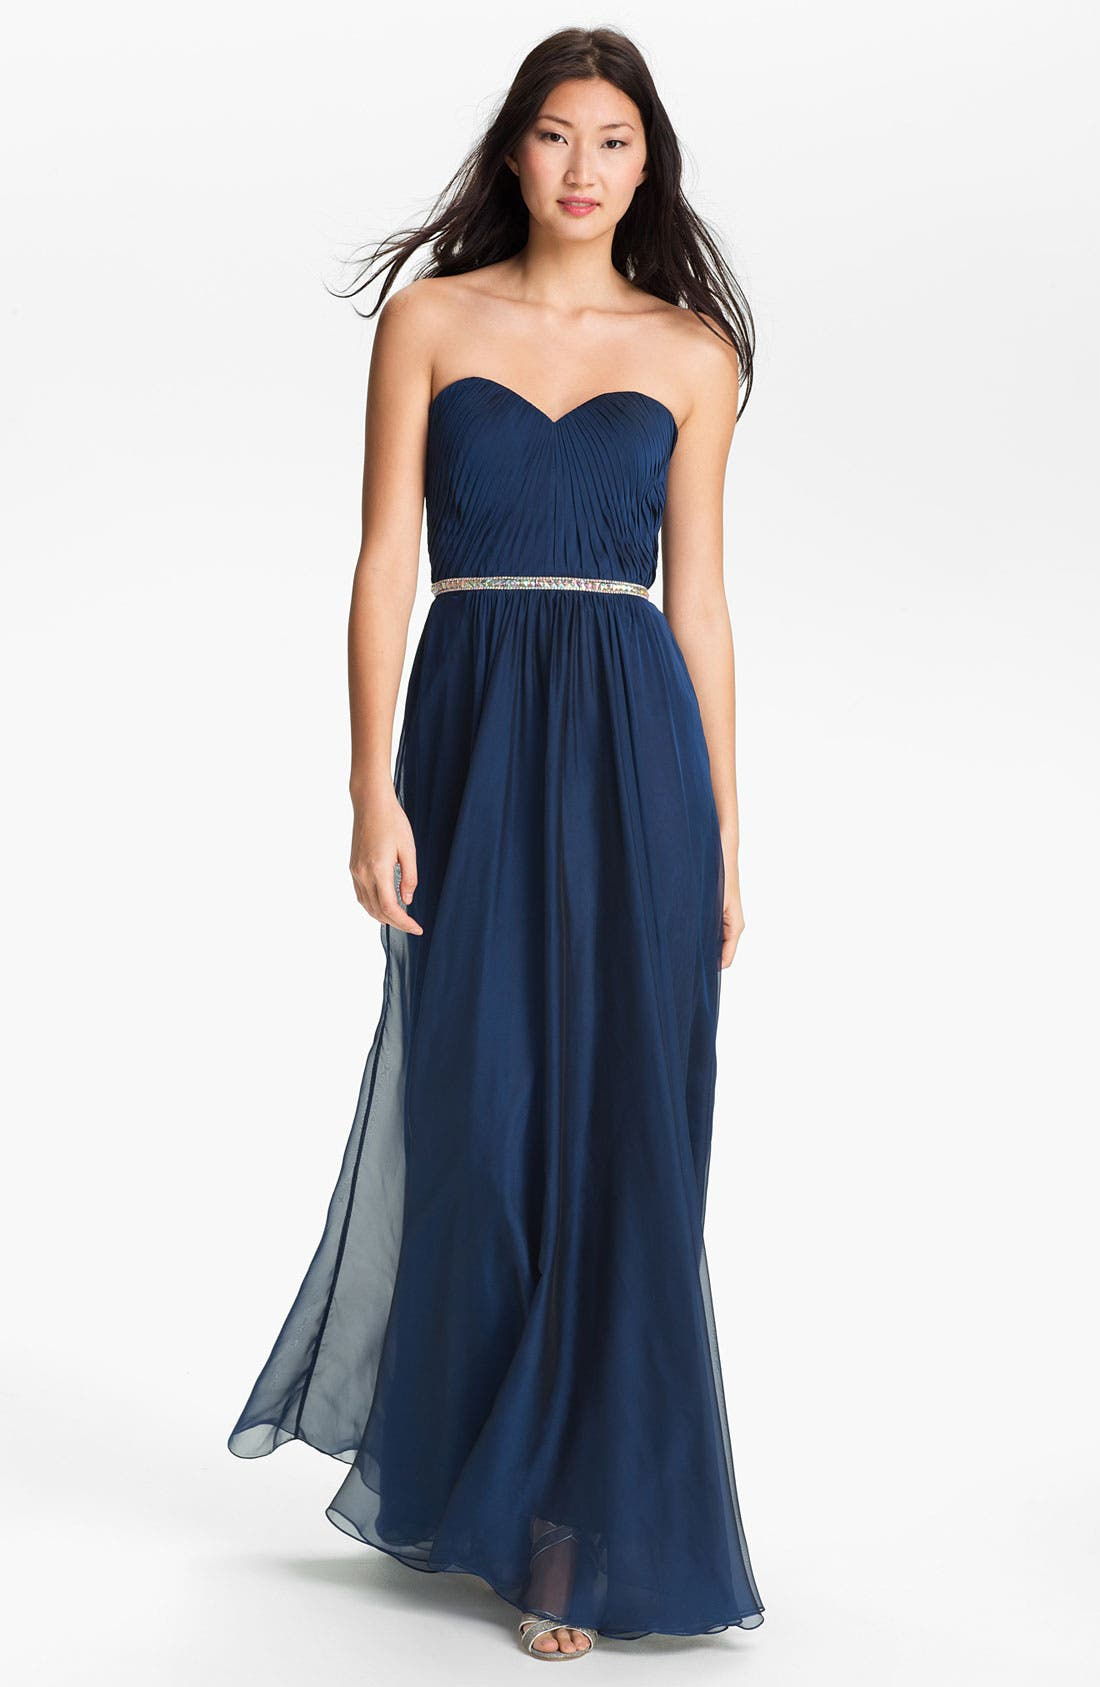 Alternate Image 1 Selected - La Femme Embellished Chiffon Strapless Gown